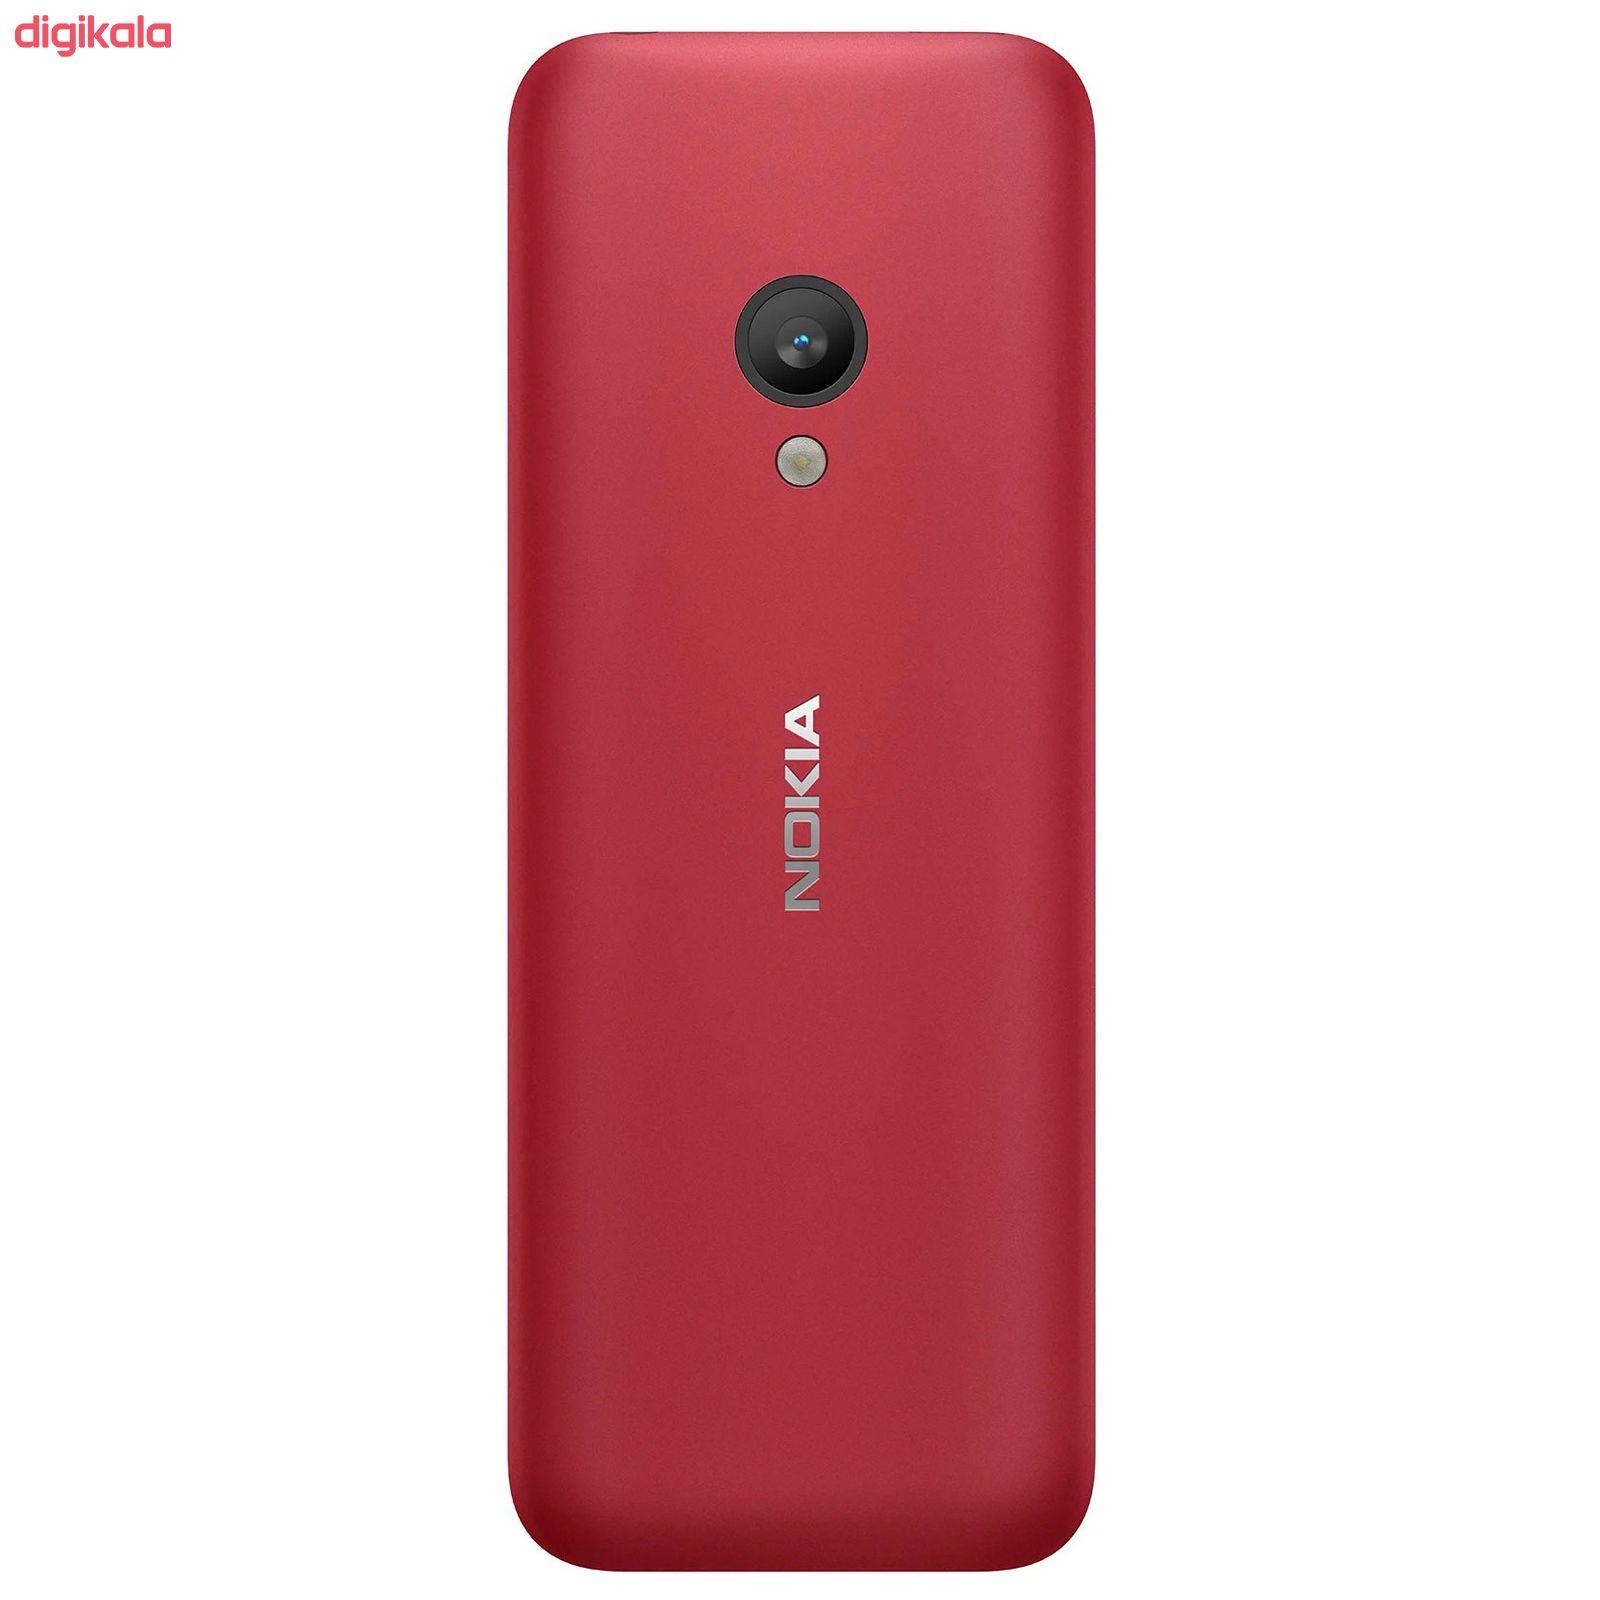 گوشی موبایل نوکیا مدل 150 - 2020 TA 1235 DS دو سیم کارت main 1 5